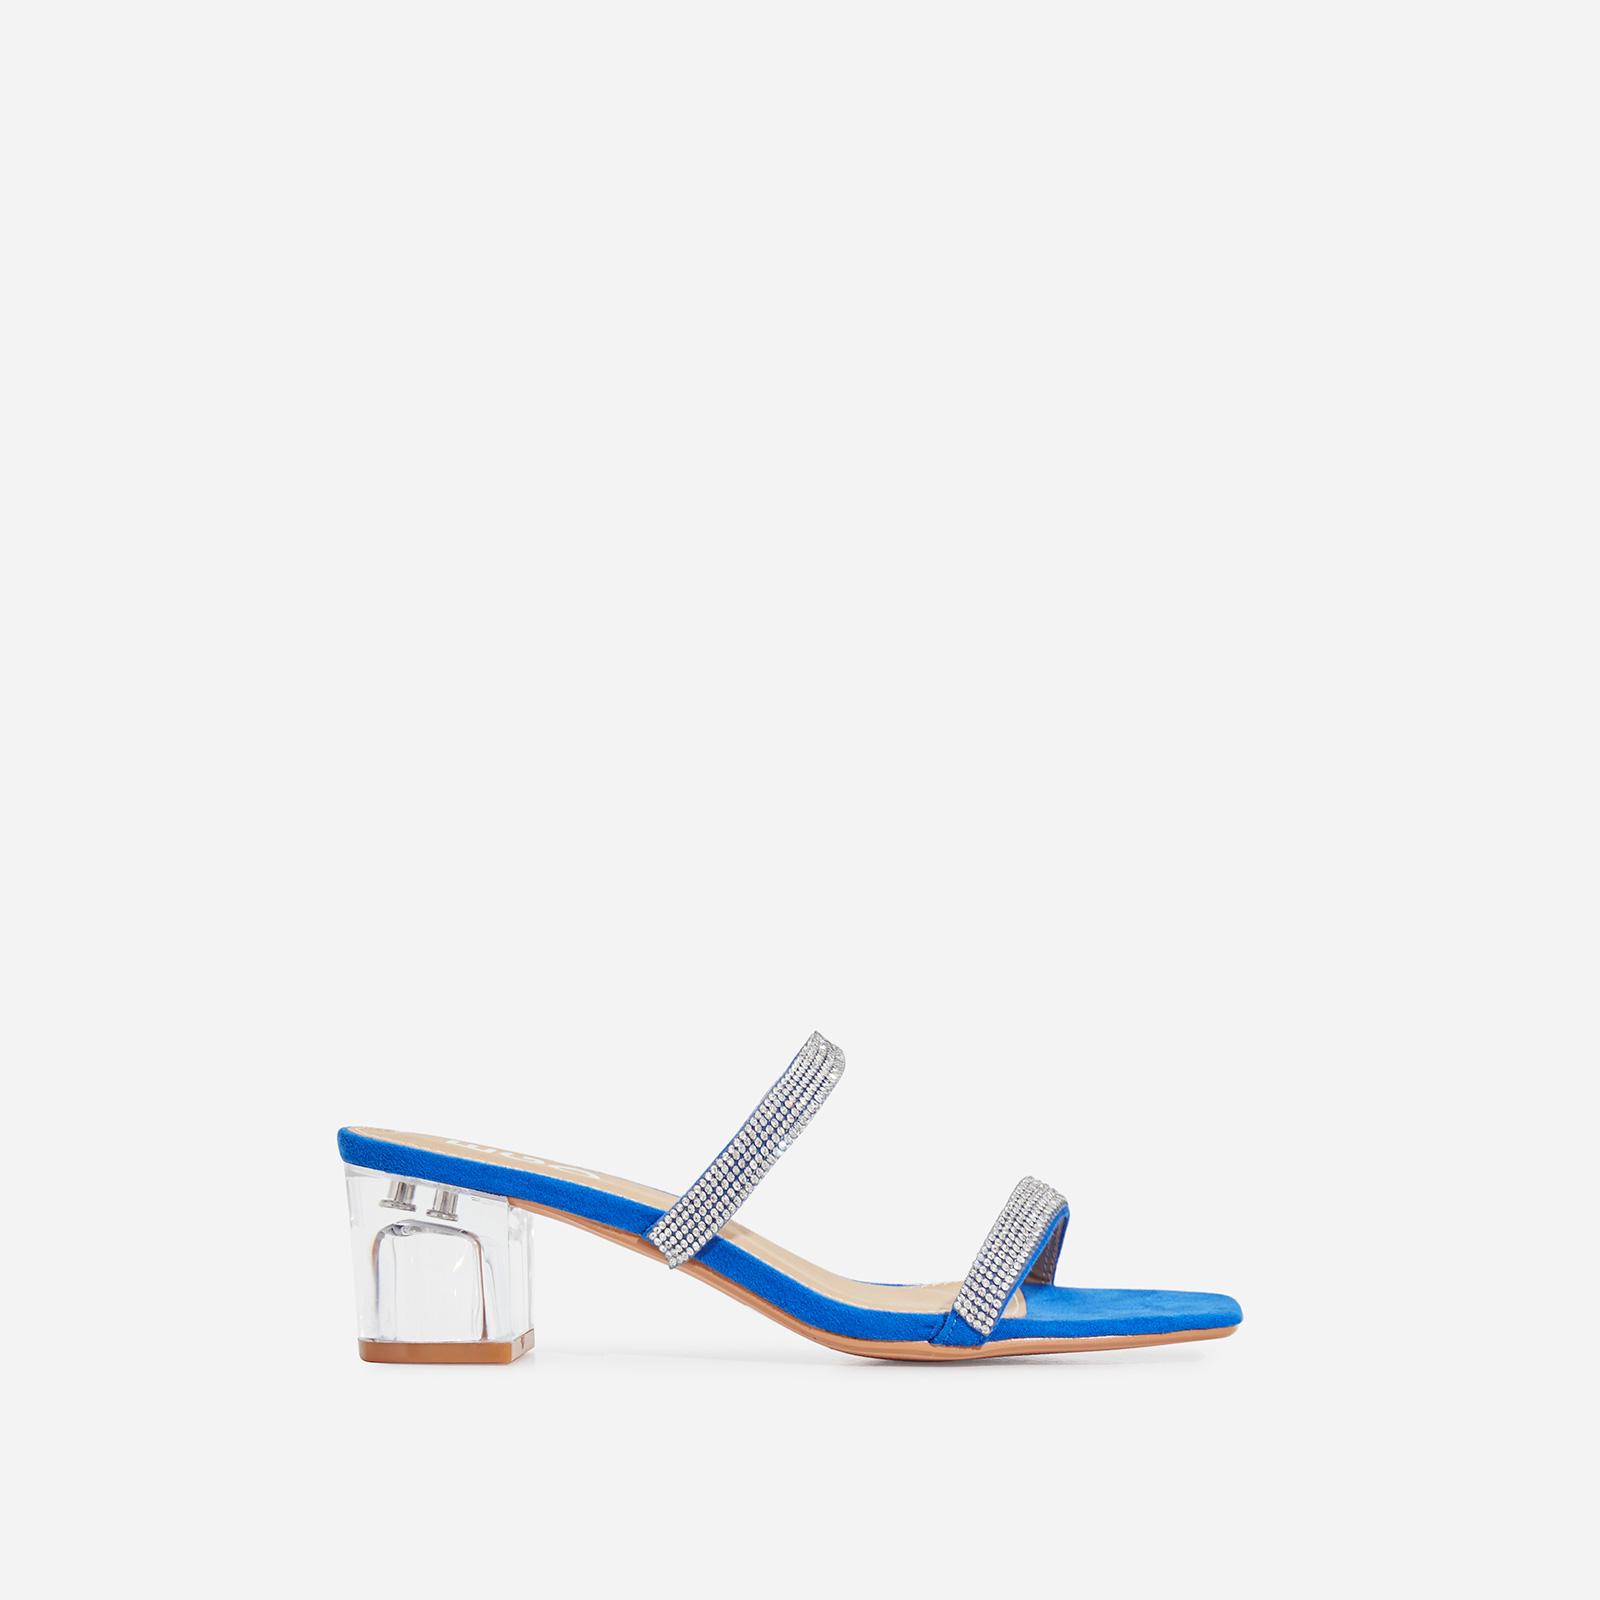 Cameo Diamante Detail Square Toe Perspex Midi Block Heel Mule In Blue Faux Suede